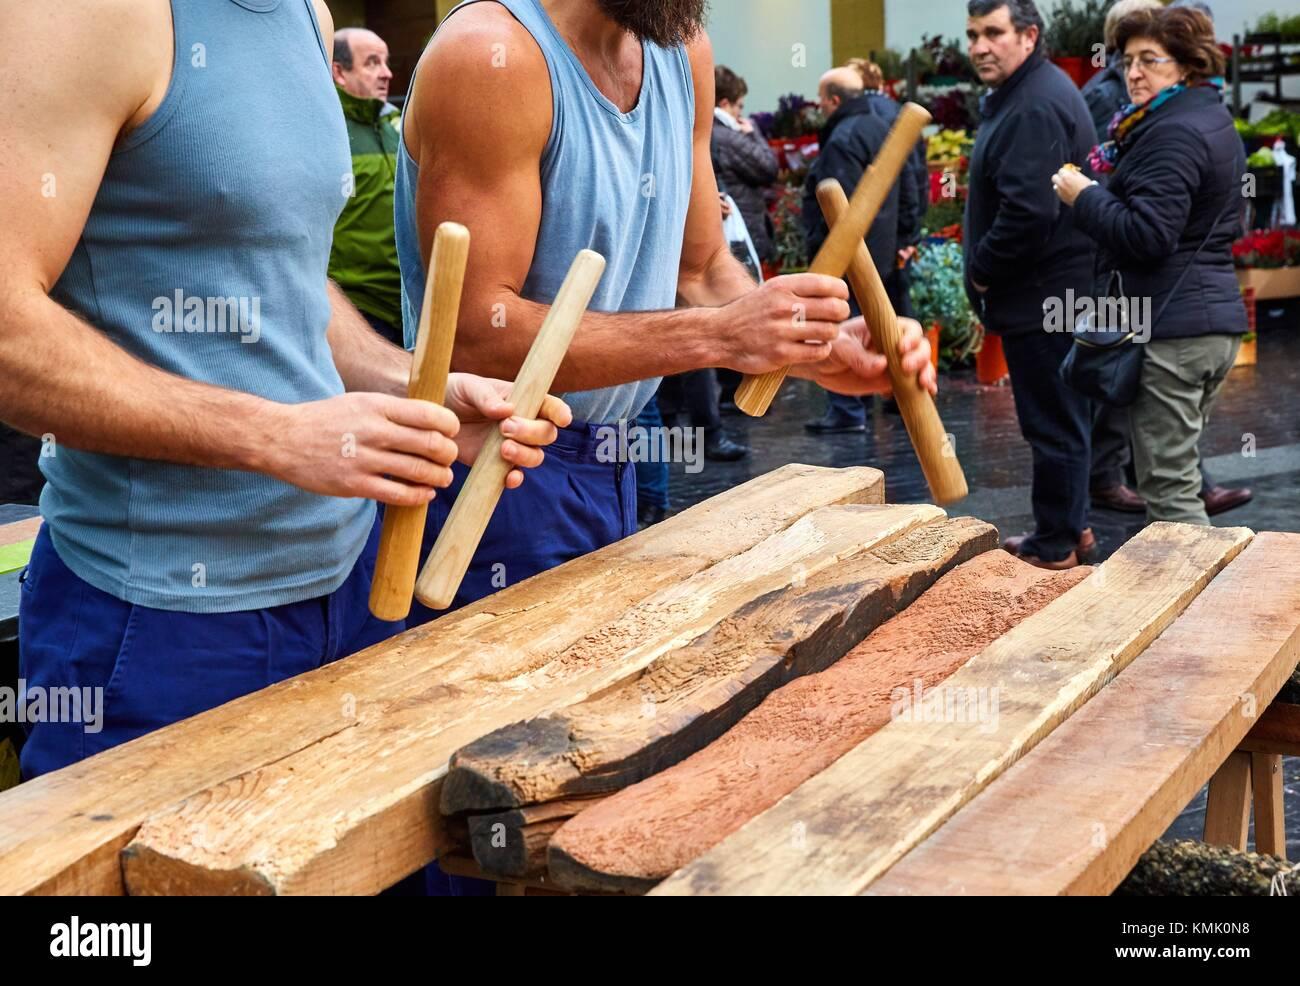 Txalaparta (Basque typical wooden percussion instrument), Feria de Santo Tomás, The feast of St. Thomas takes - Stock Image